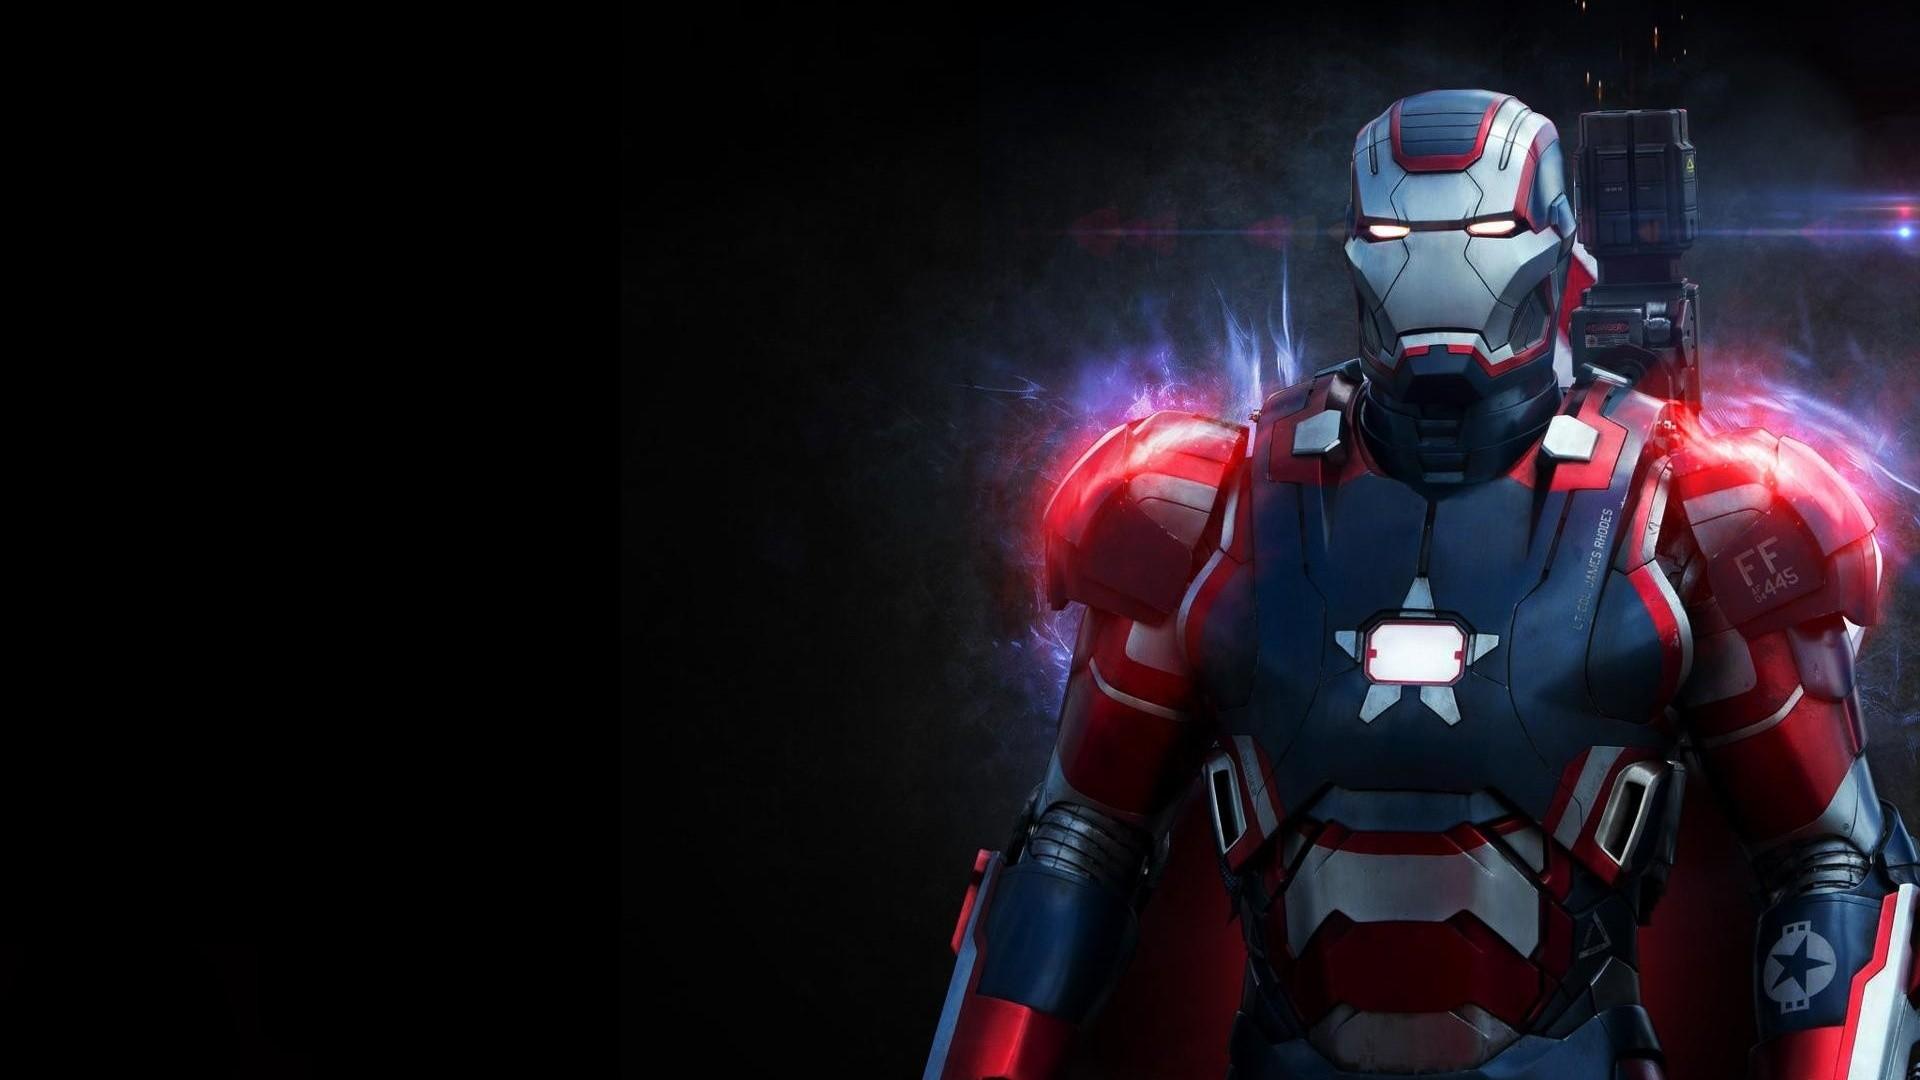 Iron Patriot desktop PC and Mac wallpaper